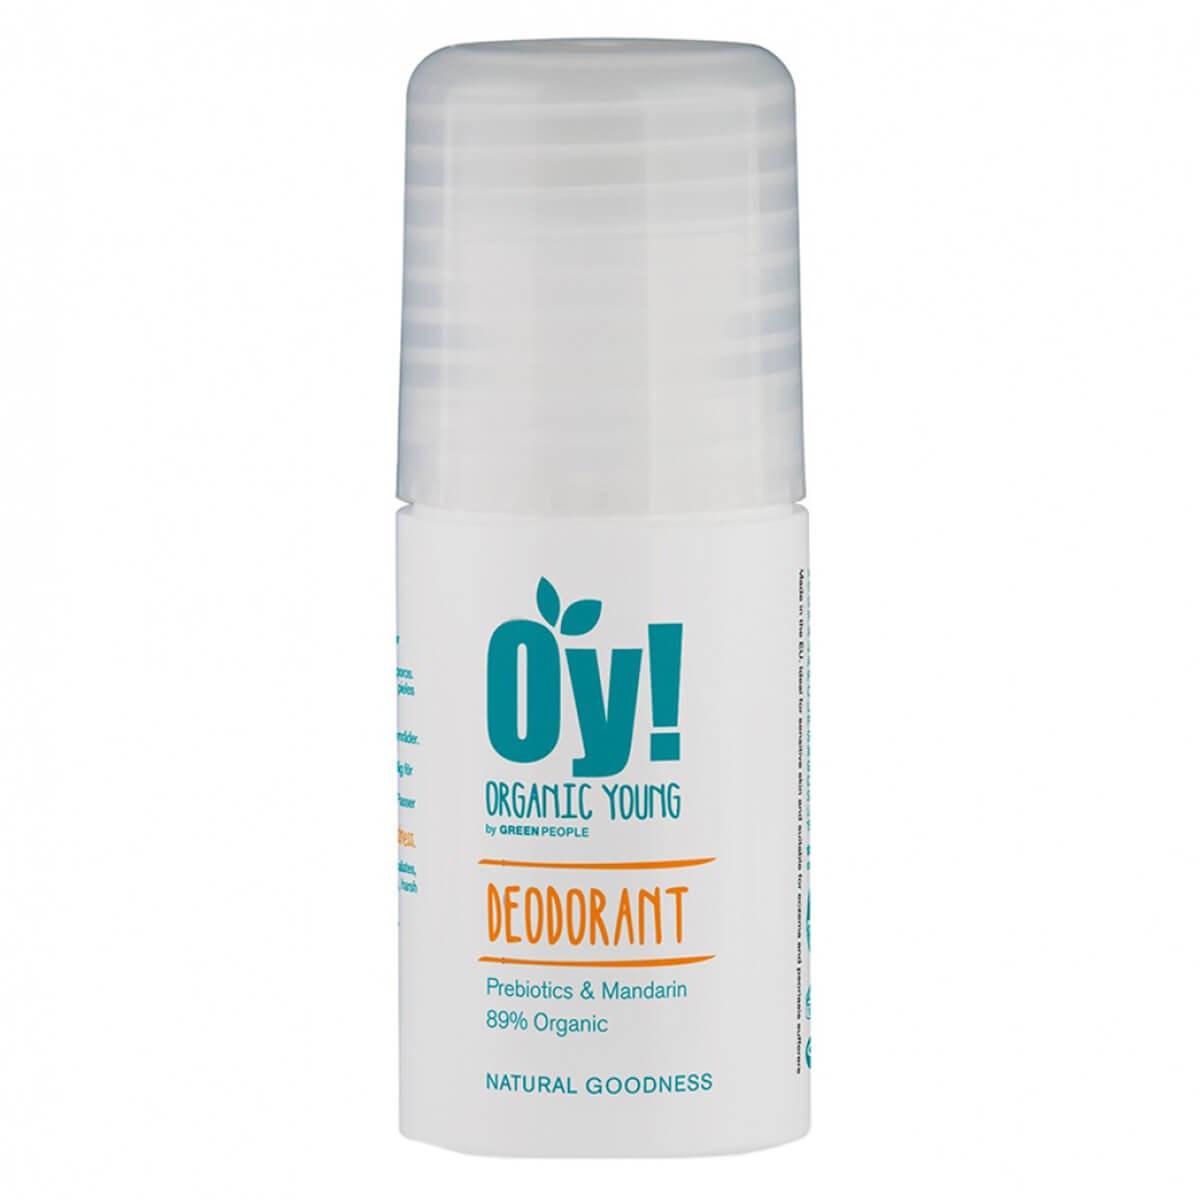 Green People Organic Oy! Prebiotics & Mandarin Deodorant